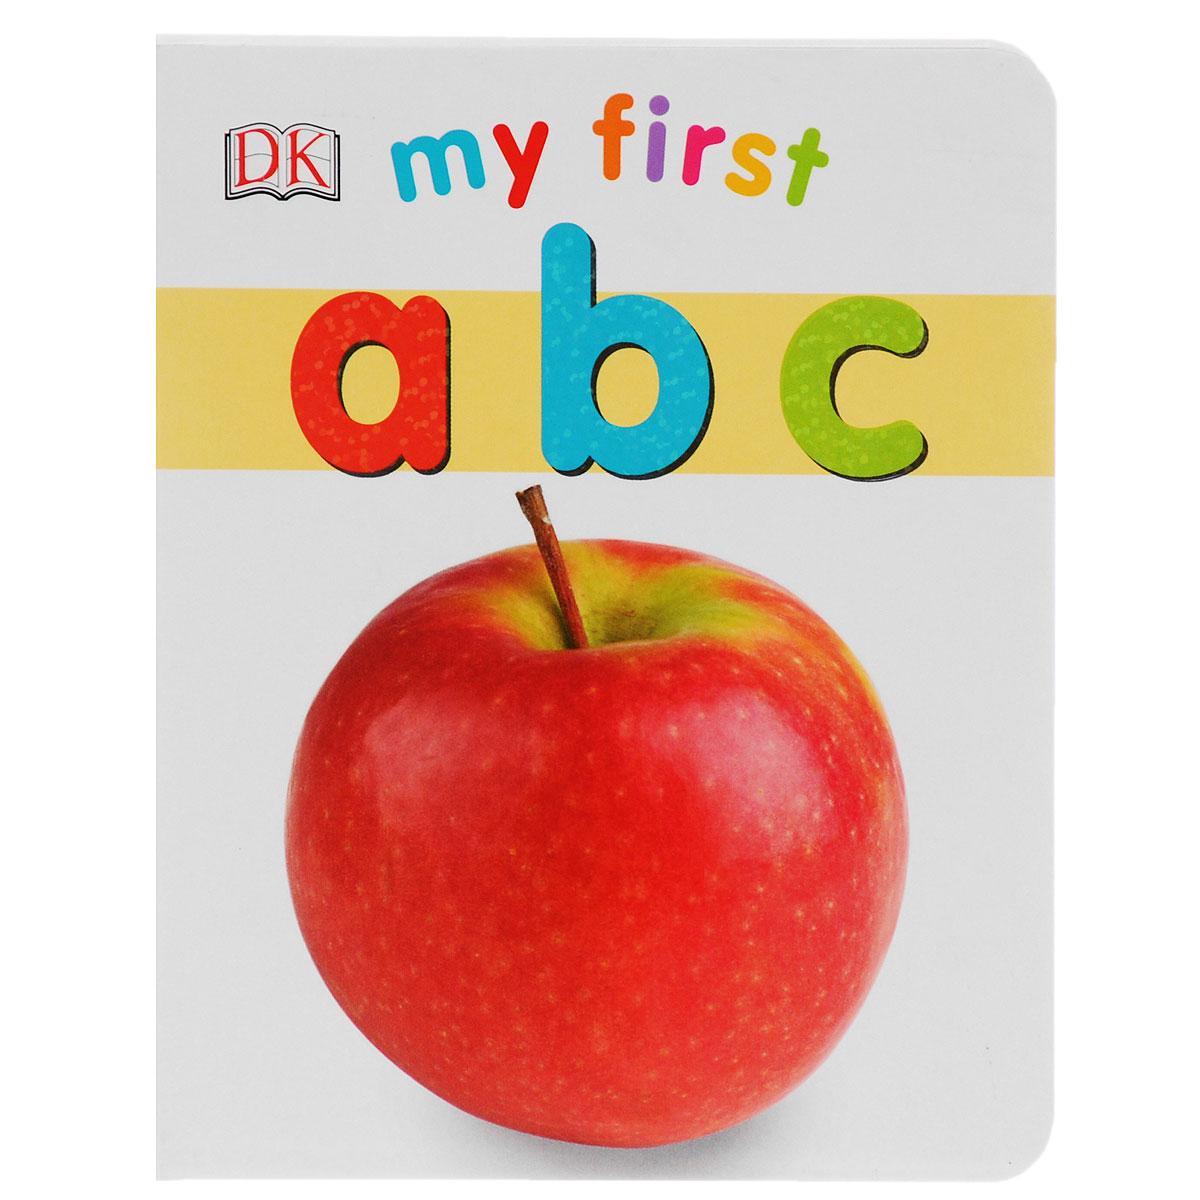 My First: A B C